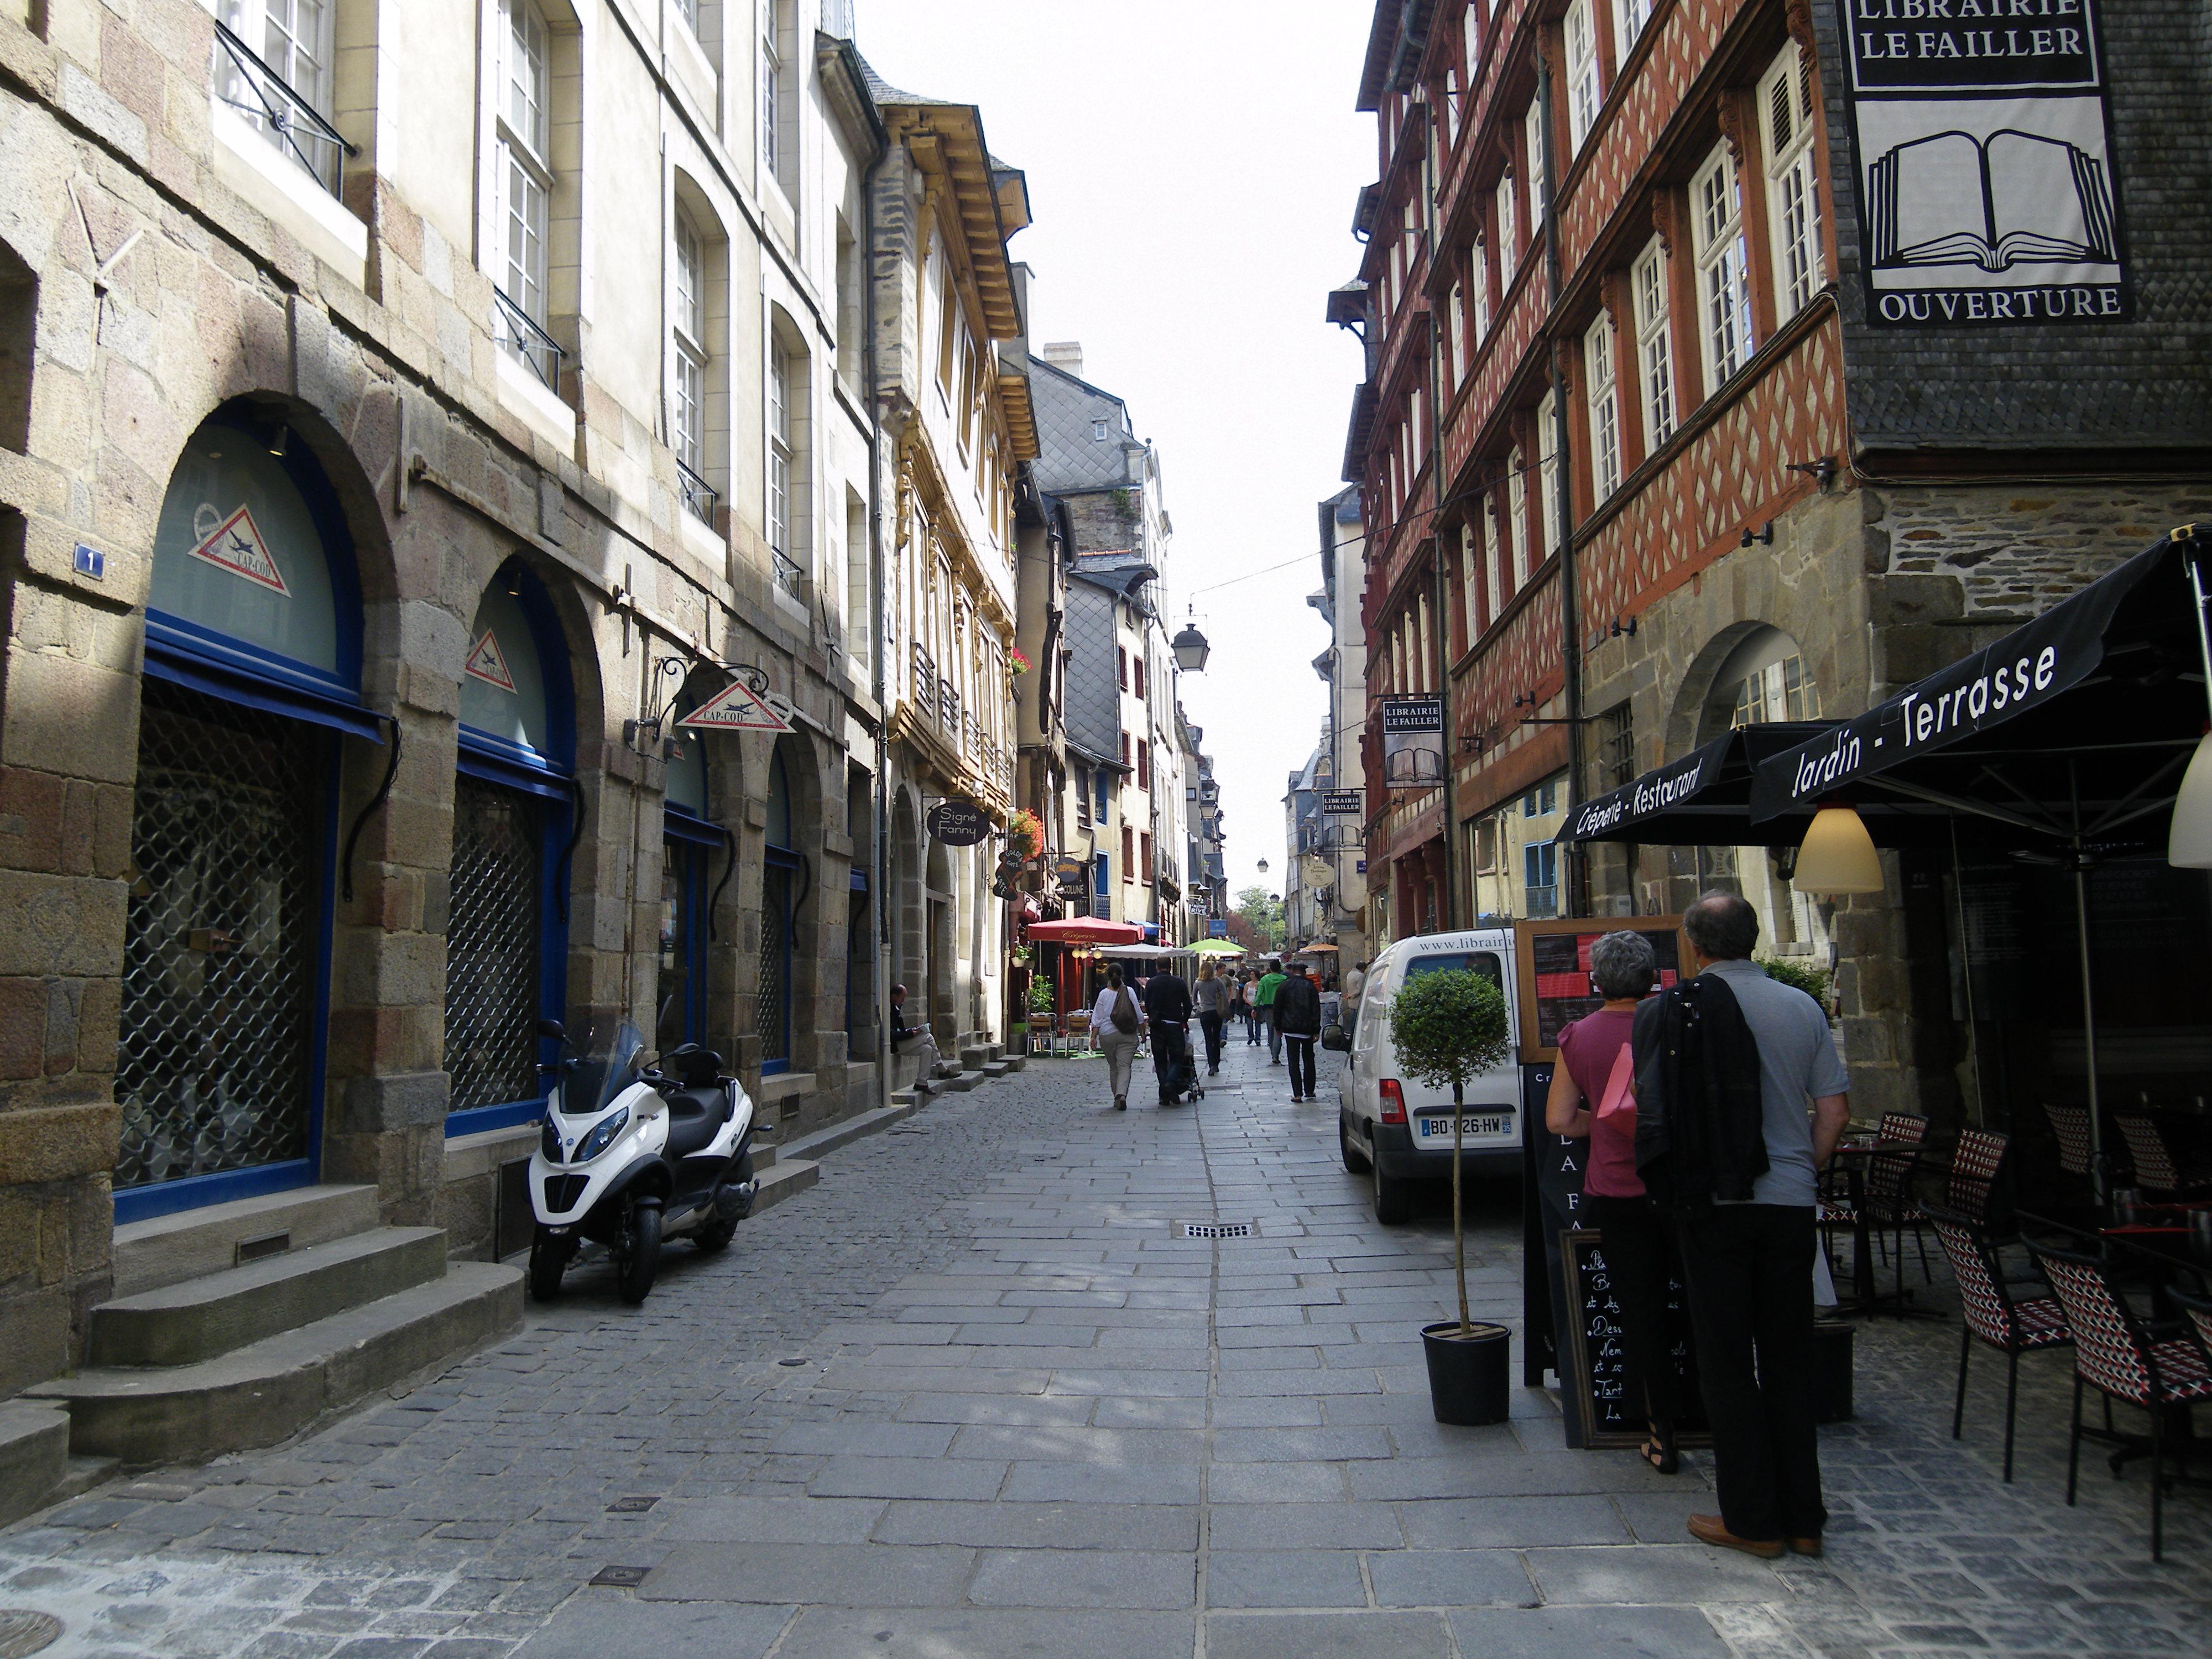 File:La rue saint georges a rennes - panoramio.jpg ...